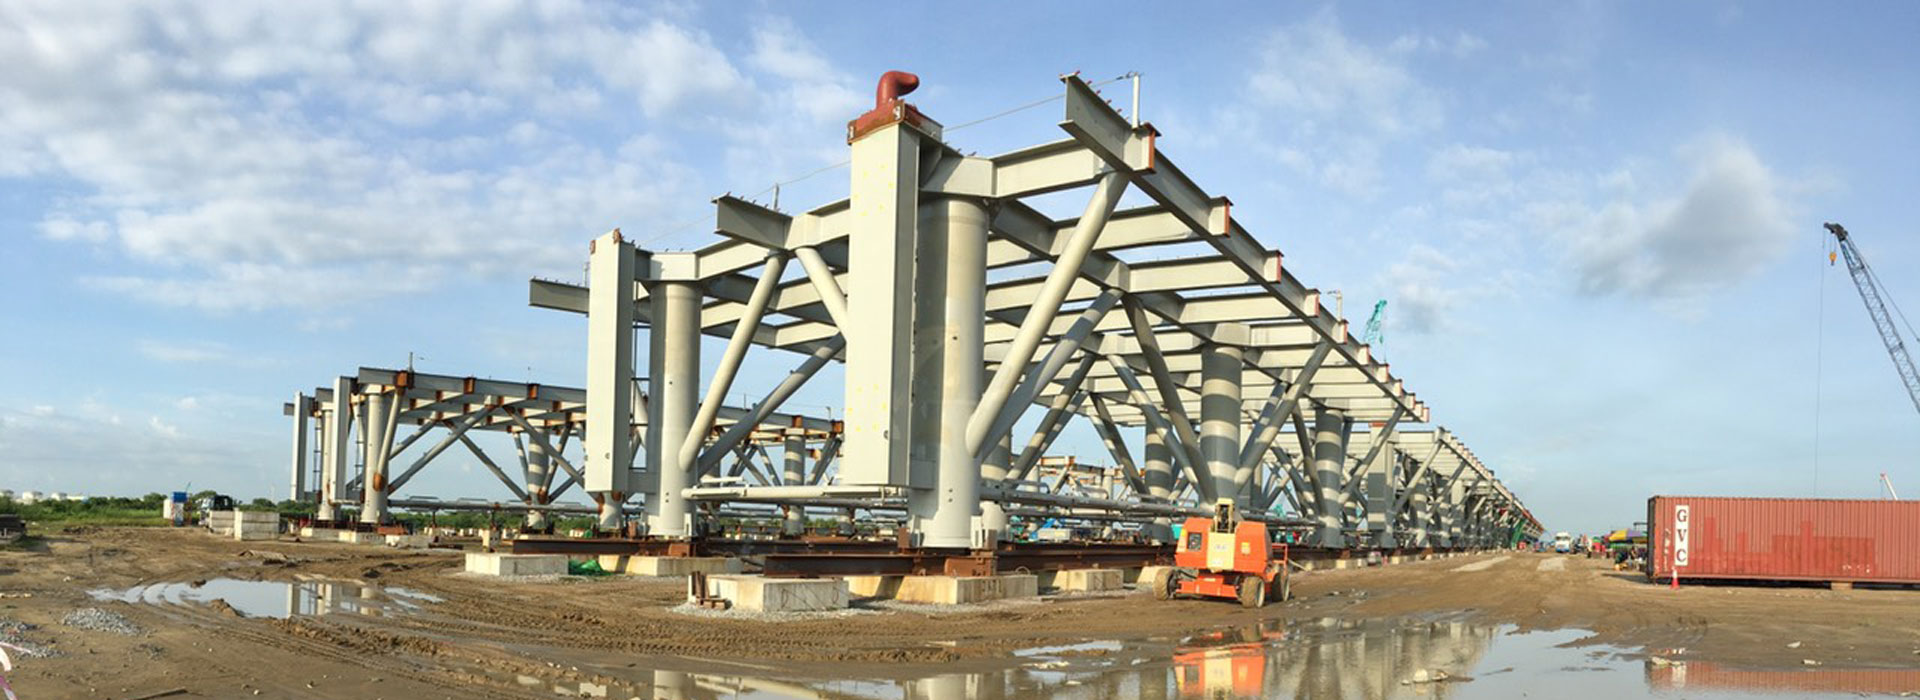 Triple Union Co , Ltd (Myanmar) | Civil Engineering